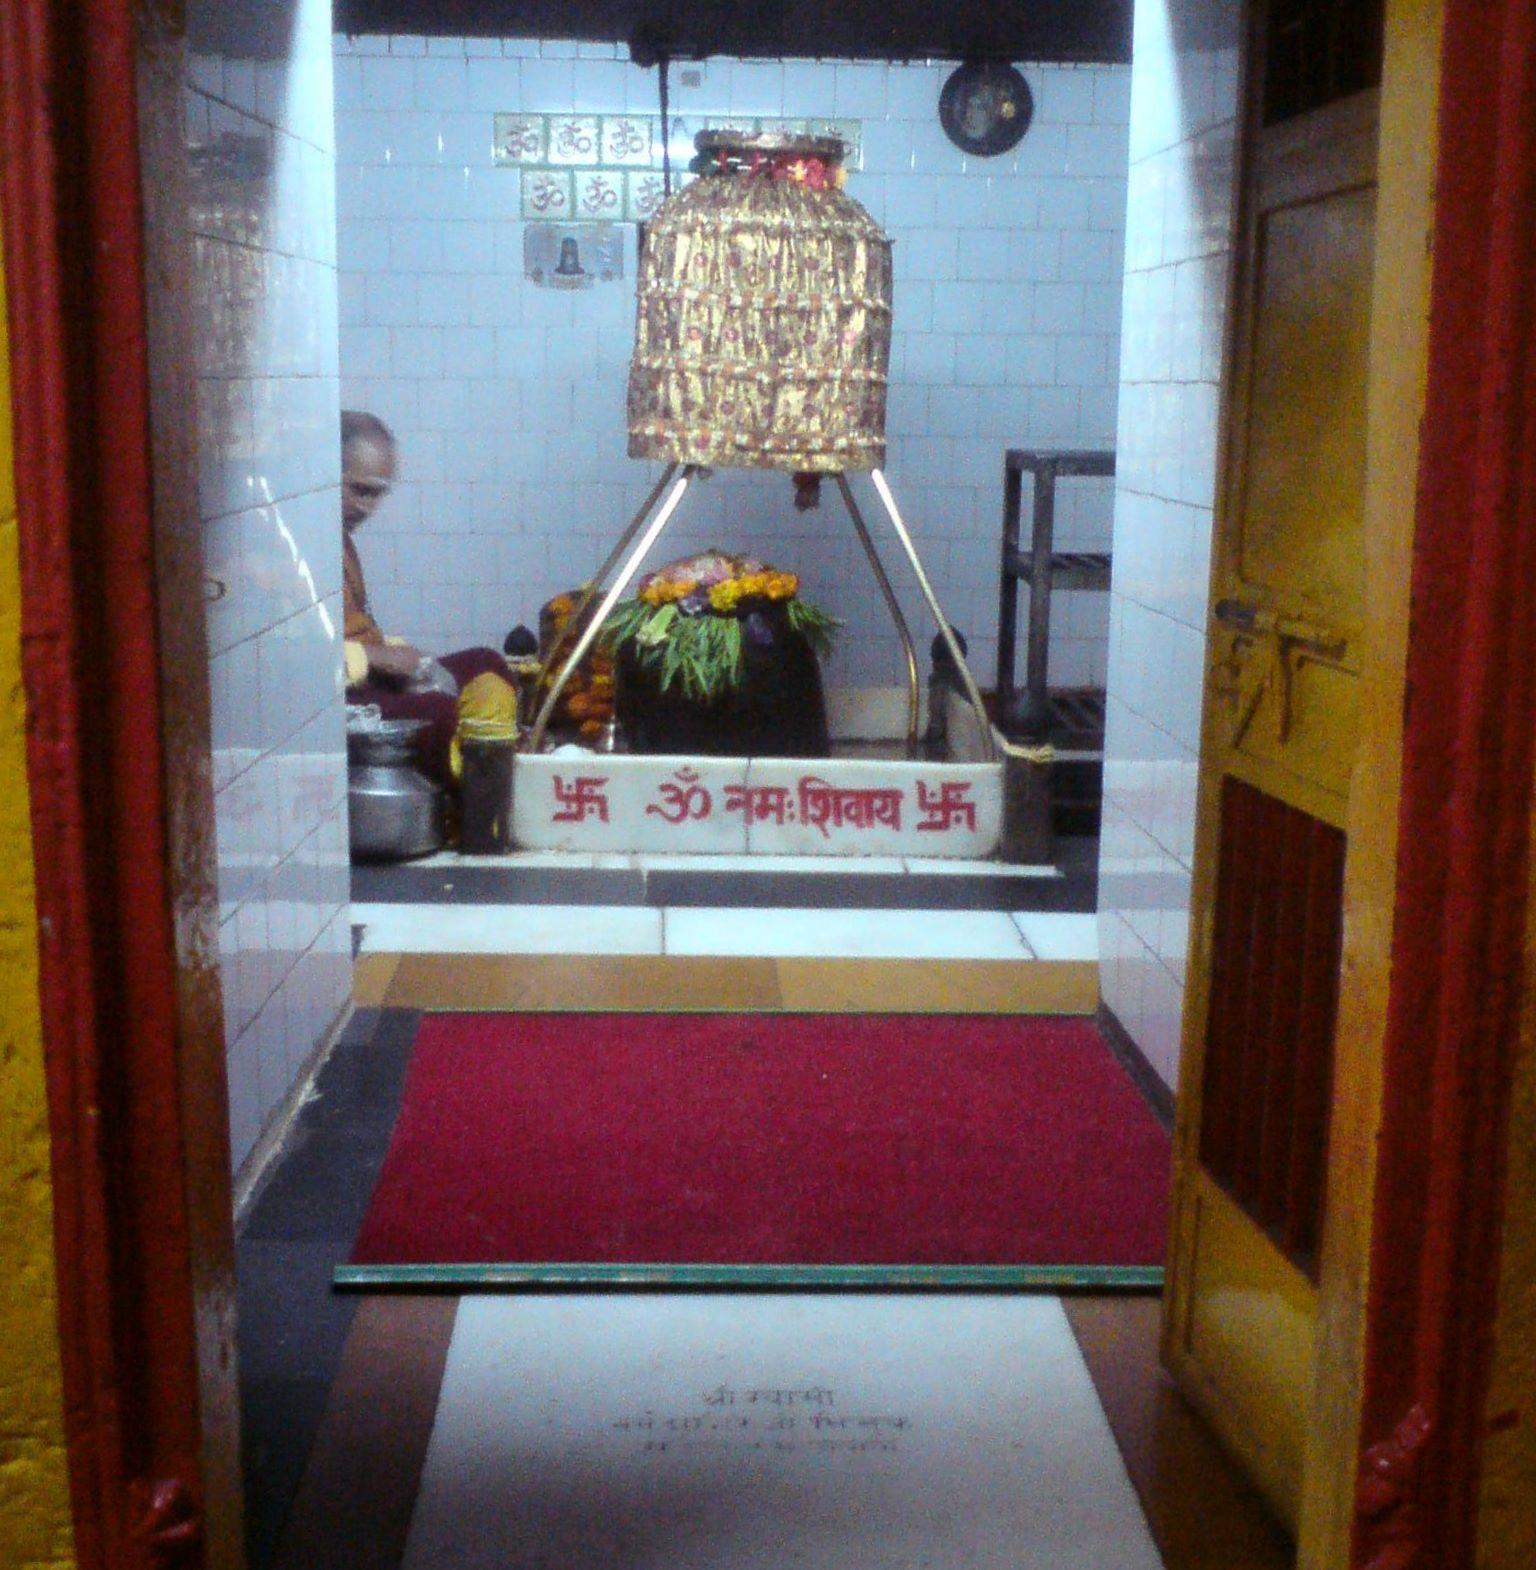 The Shivling at the Kashi Vishwanath Temple of Uttarkashi